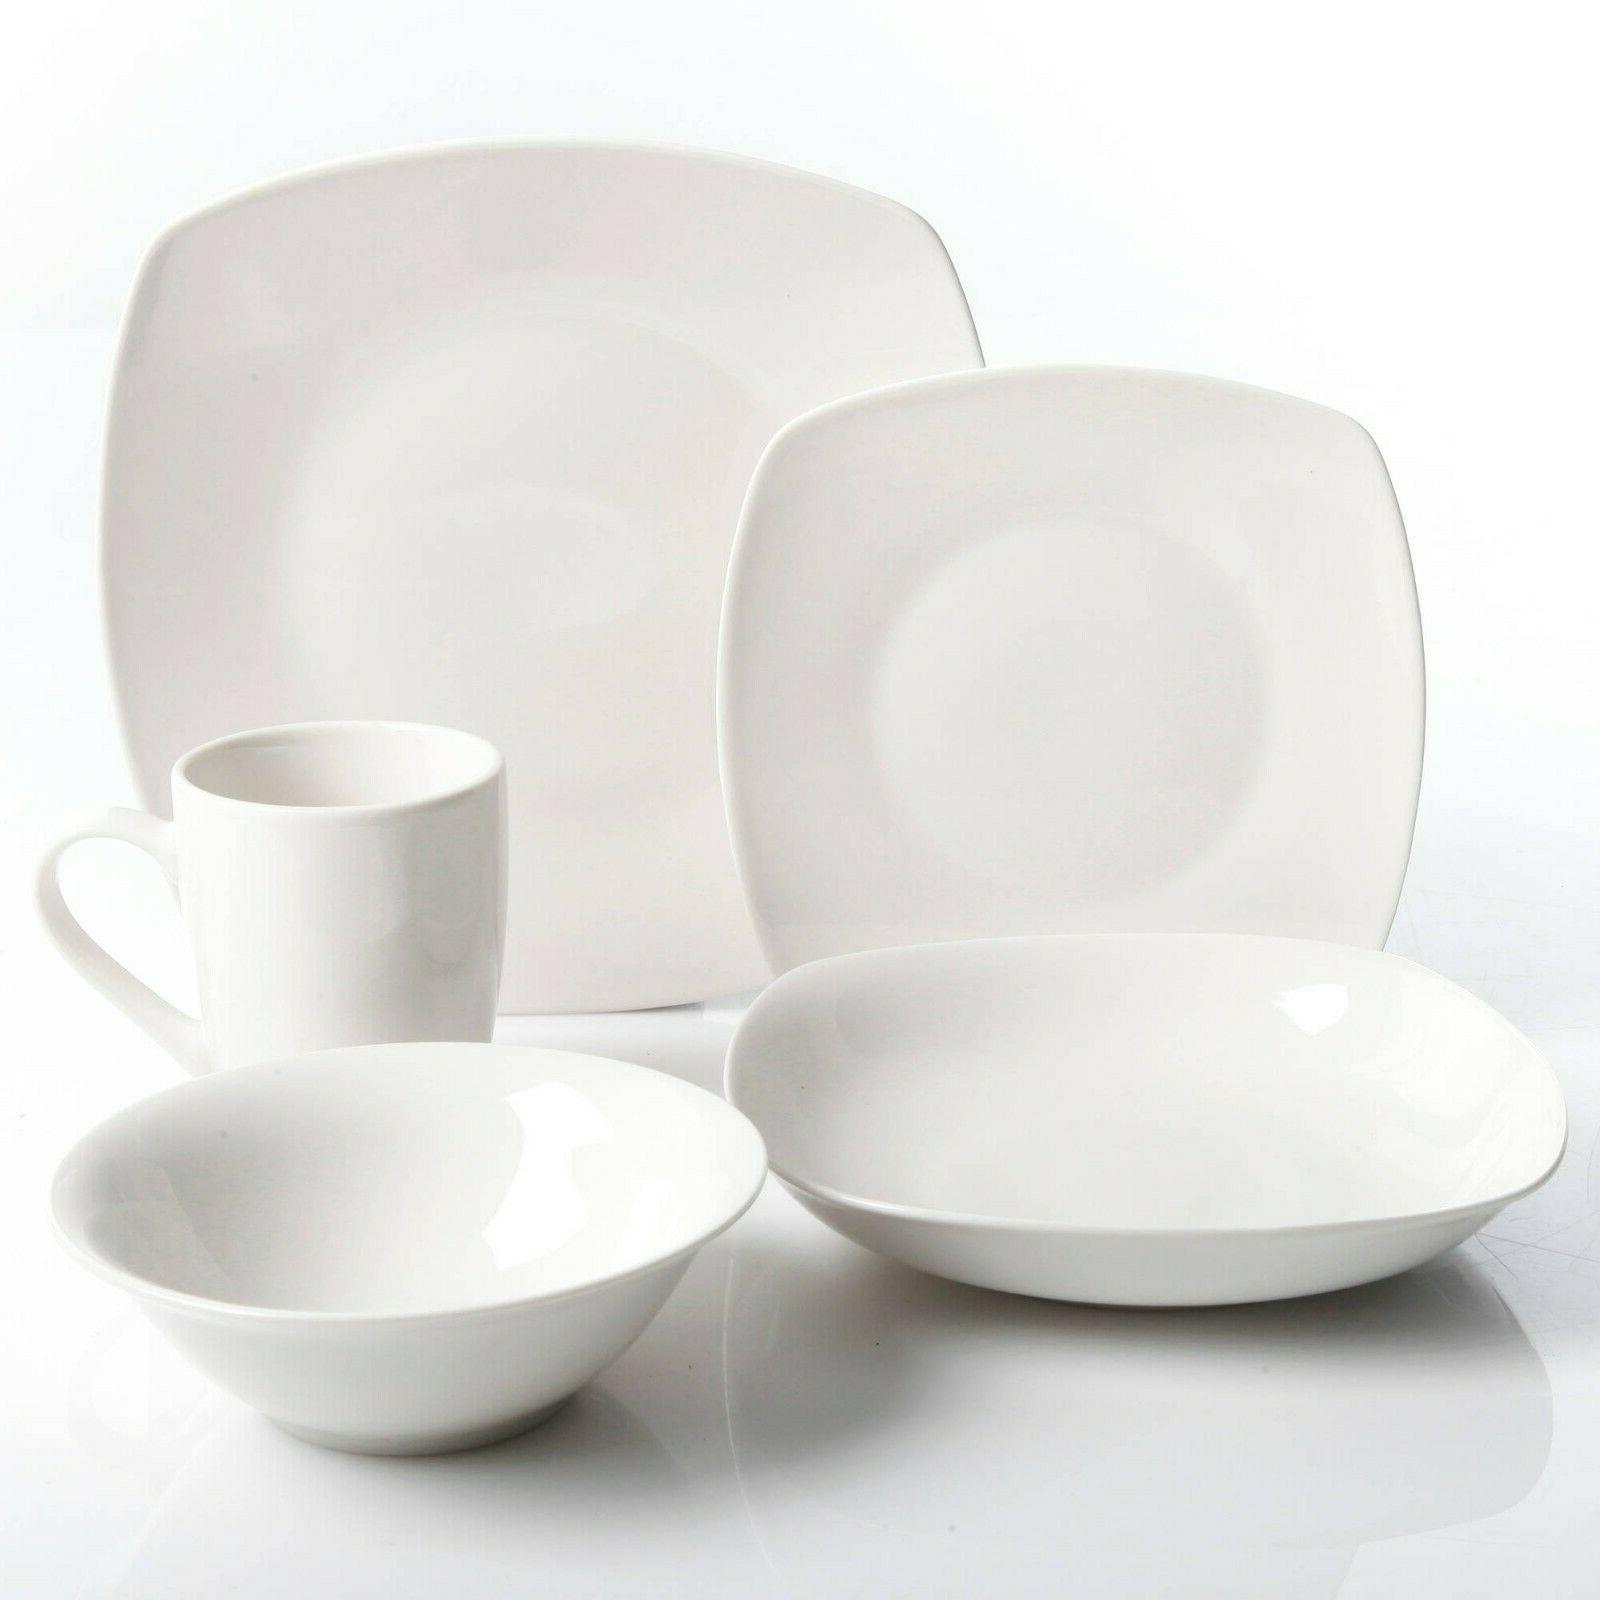 30-Piece Porcelain Dinnerware Set Square Plates Service 6 White